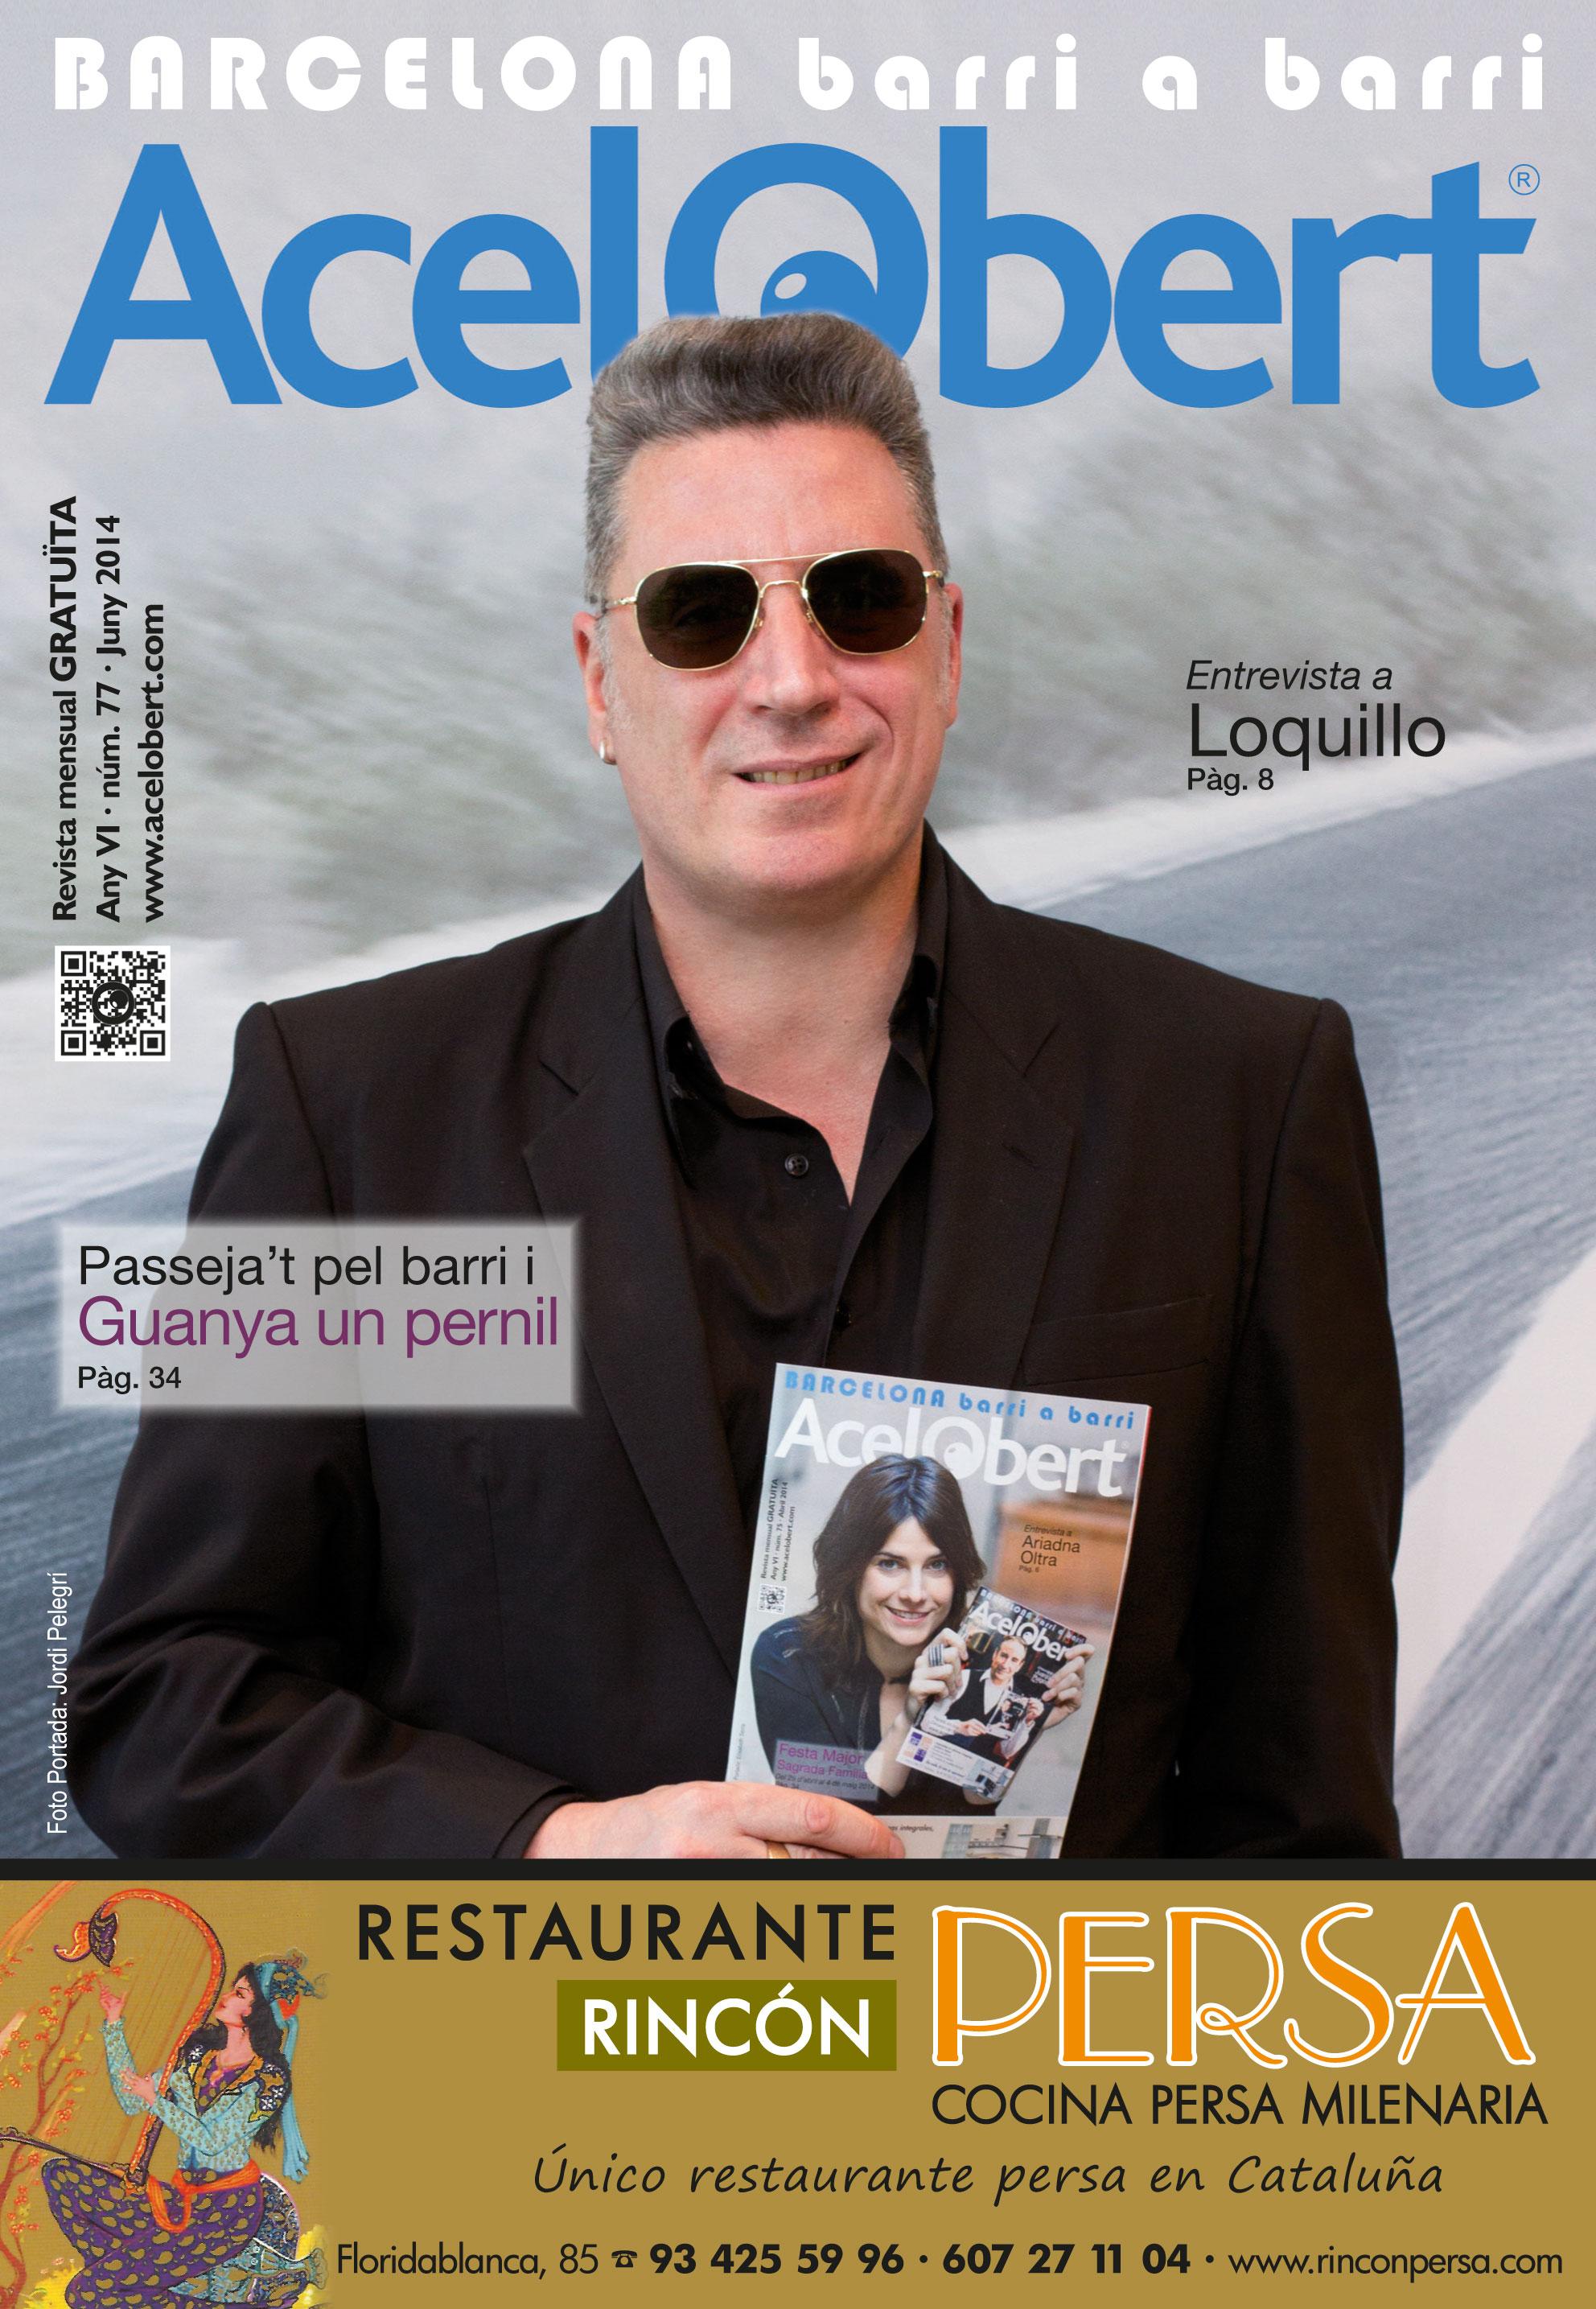 Acelobert Barcelona nº77 Juny 2014